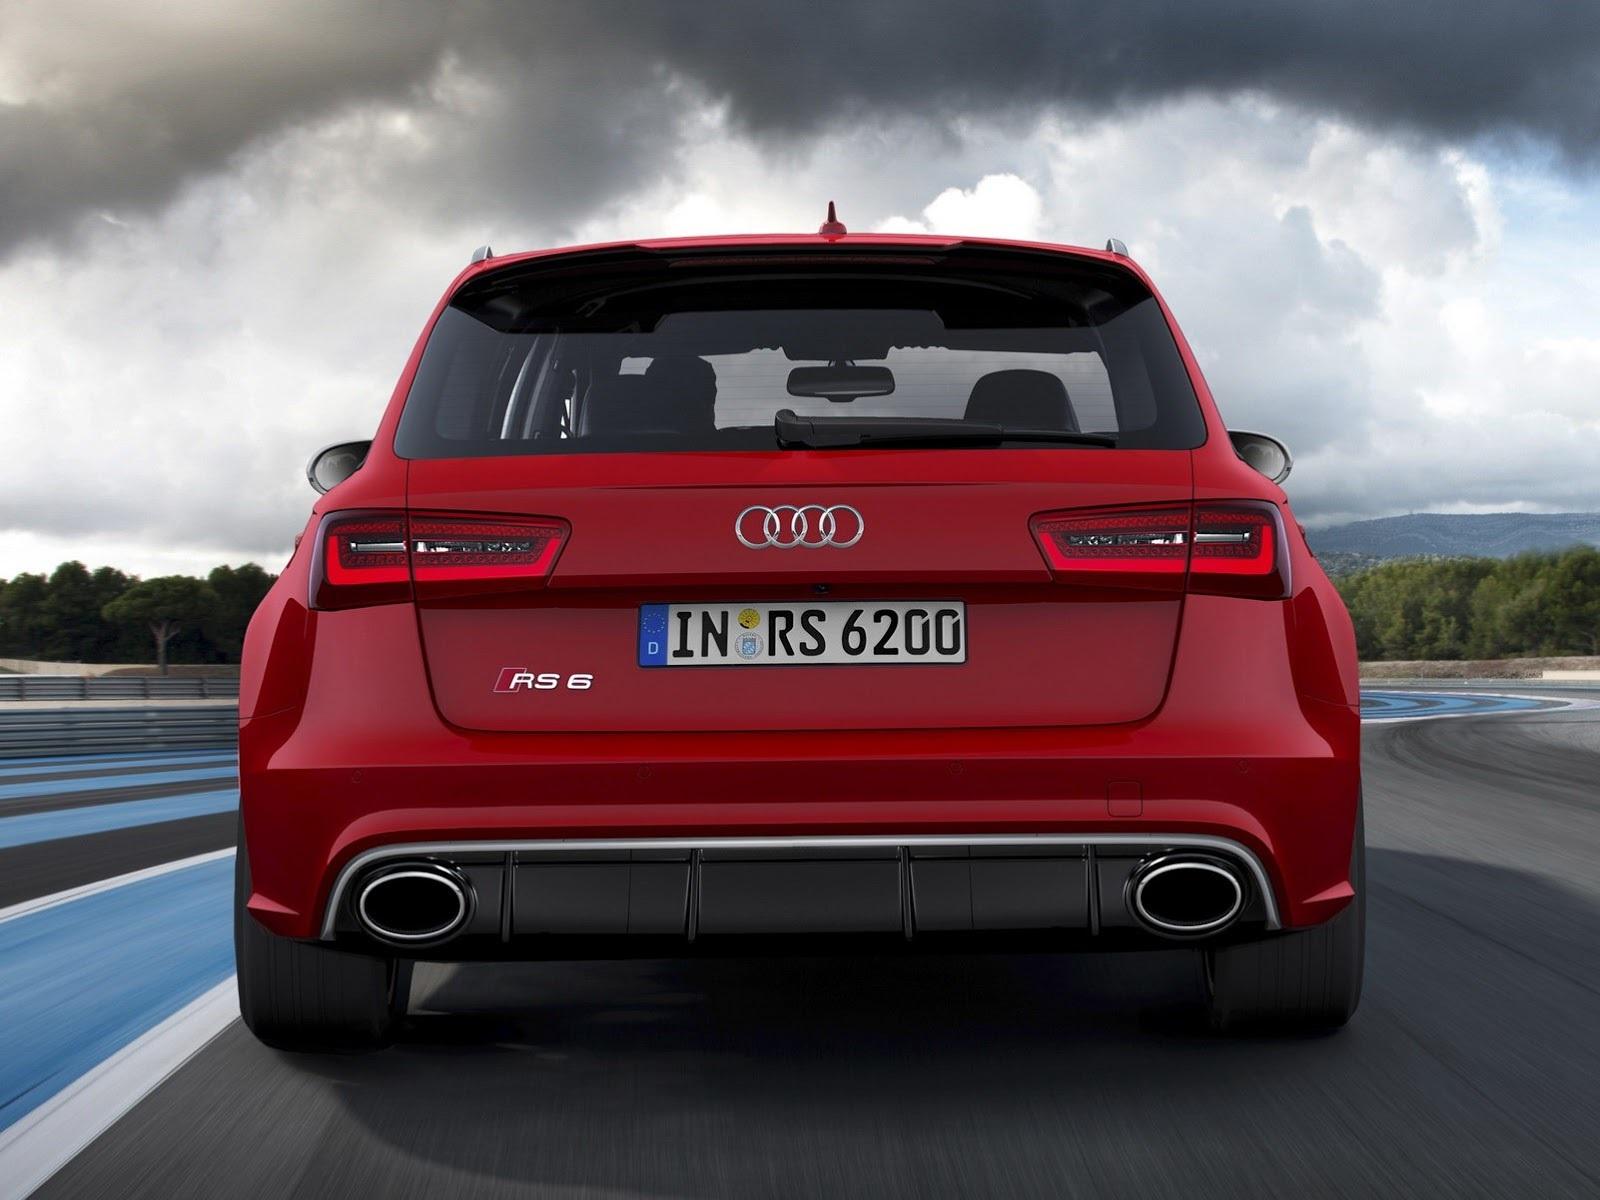 Foto de Audi RS6 Avant 2013 (7/8)